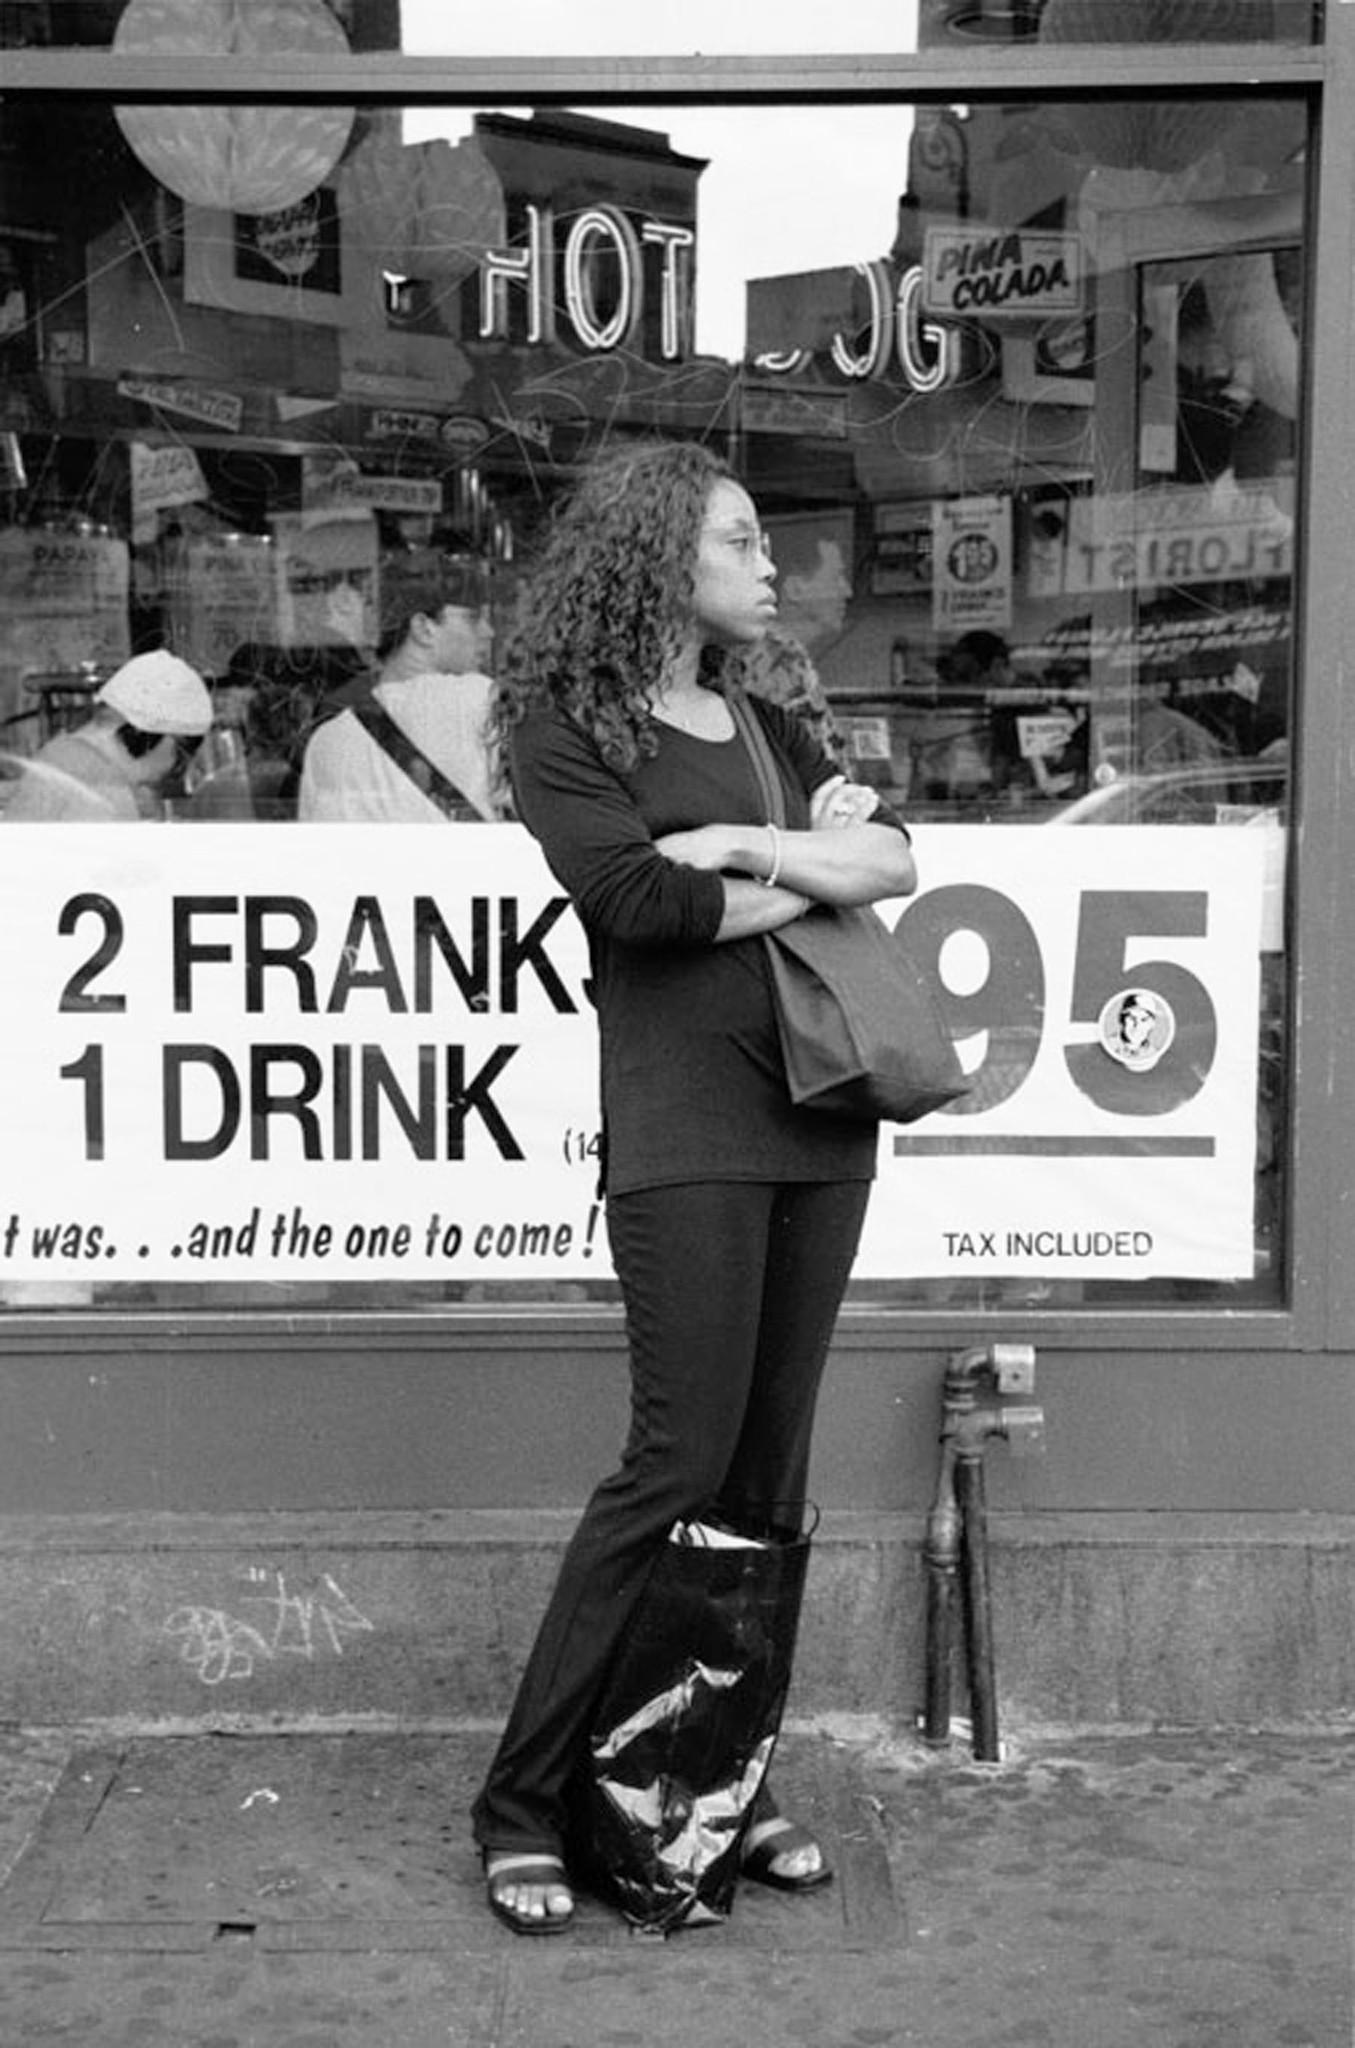 A photo taken by Arthur Lavine in 1999 of a woman in Greenwich Village, New York City.